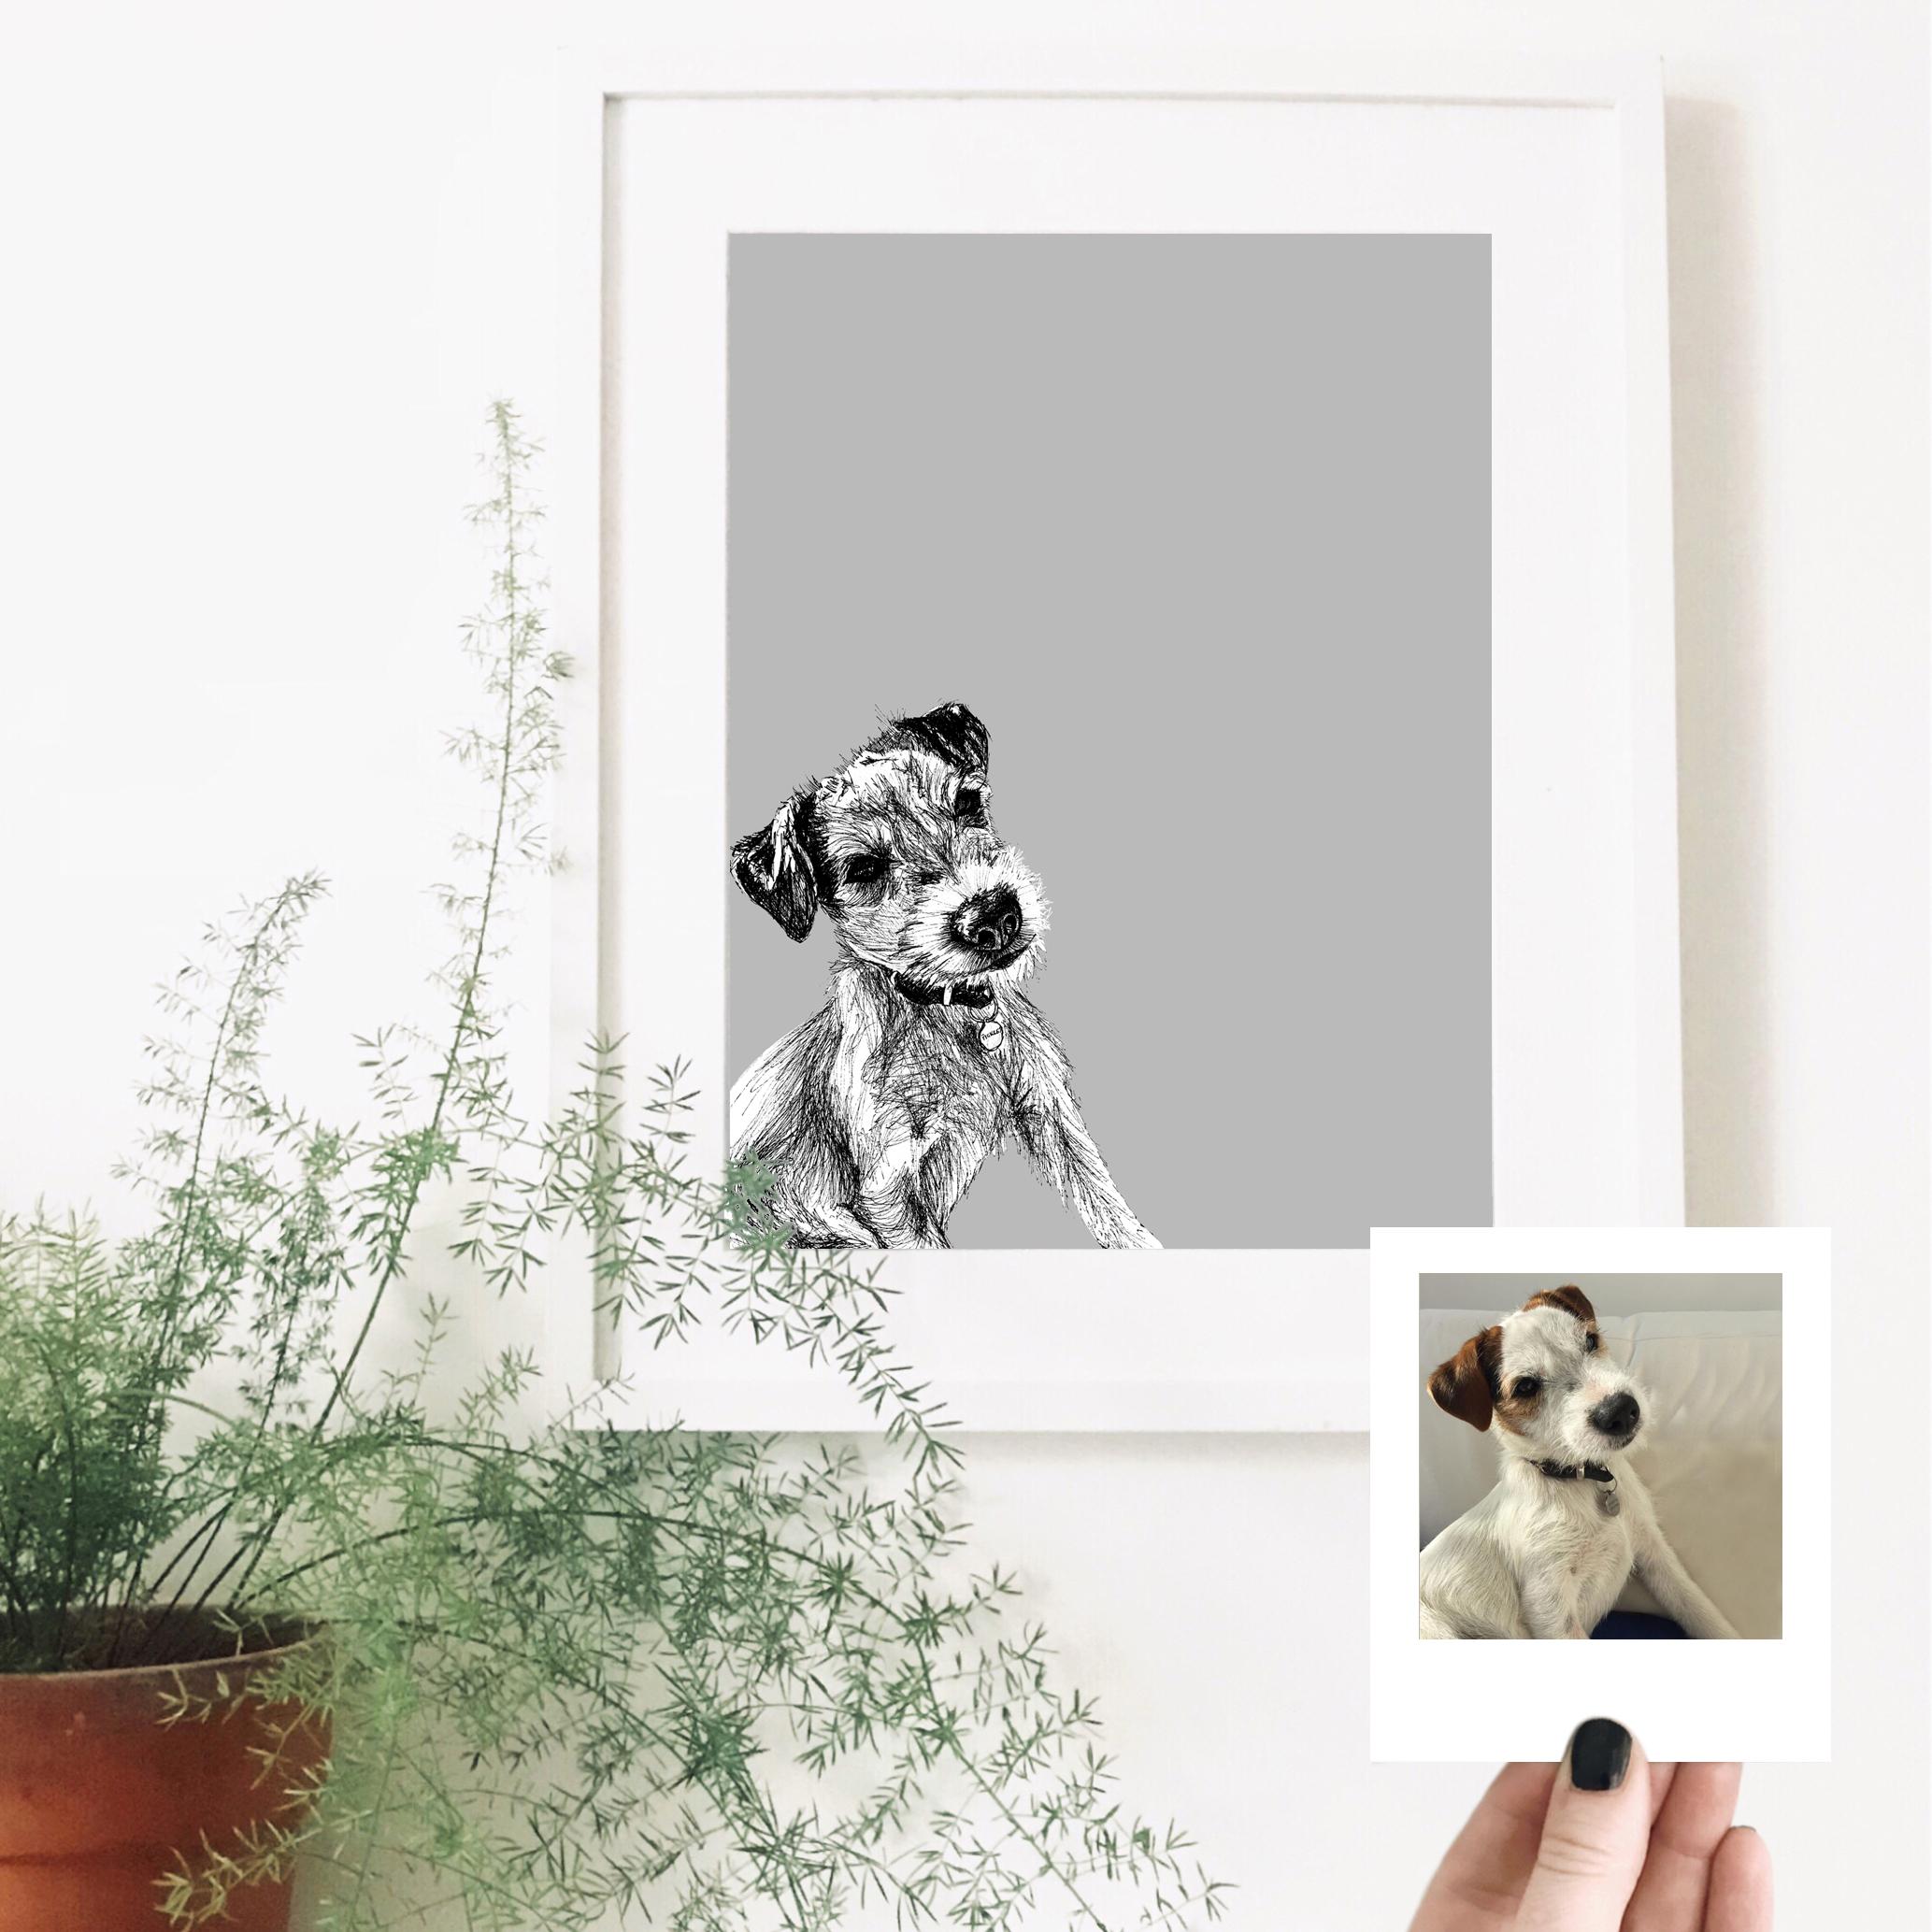 pickles-dog-pet-portrait-drawing.jpg